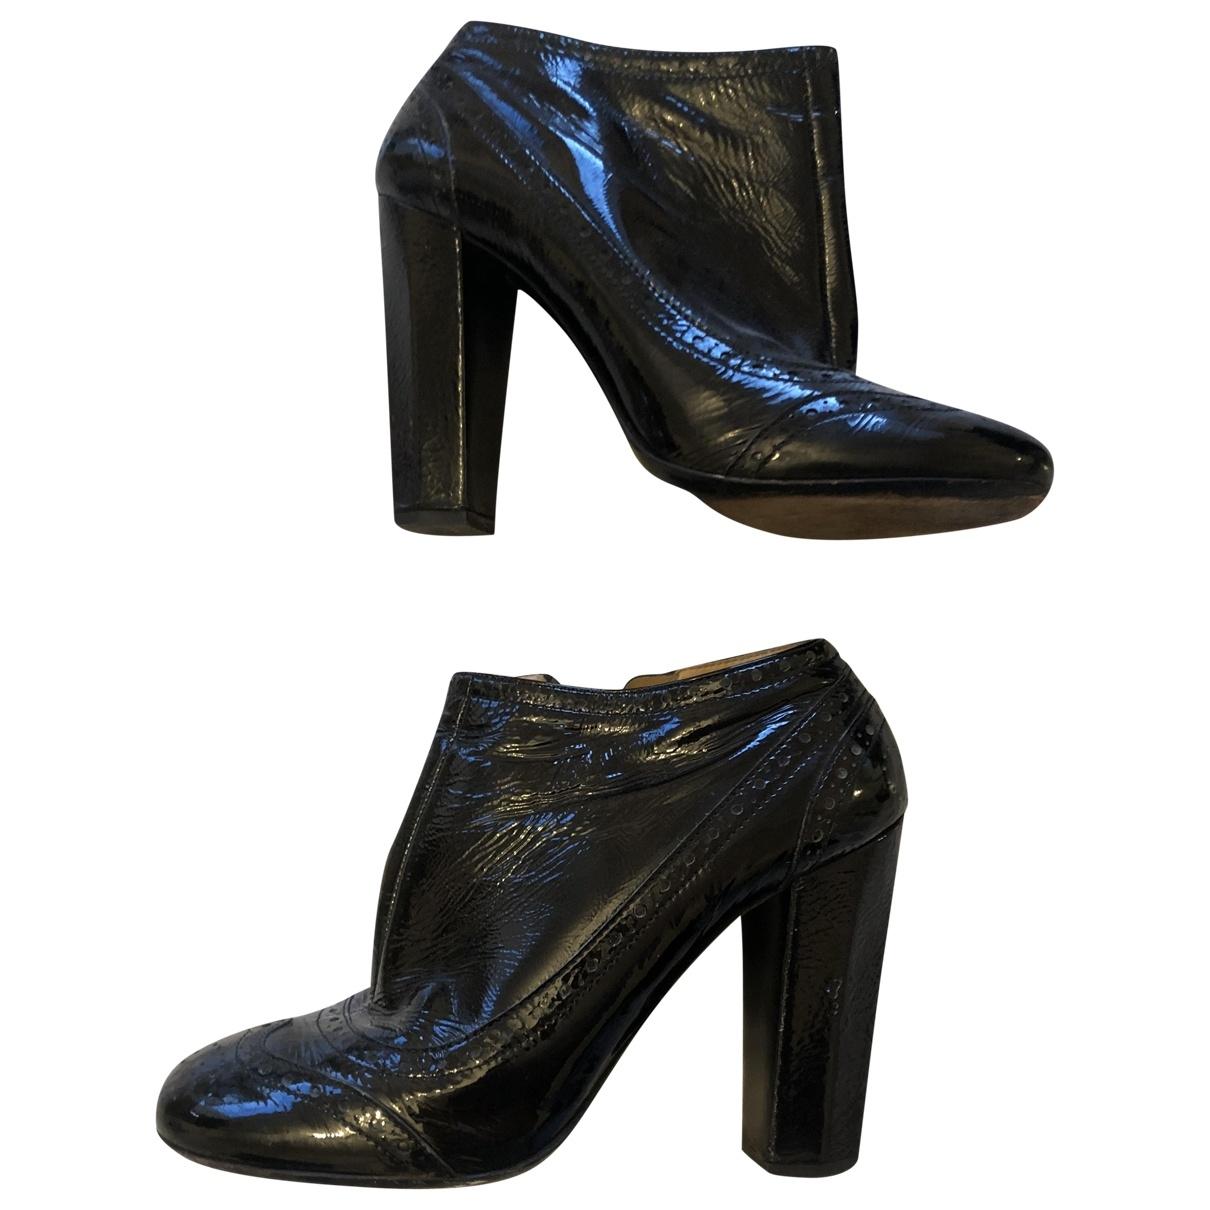 Miu Miu - Boots   pour femme en cuir verni - noir